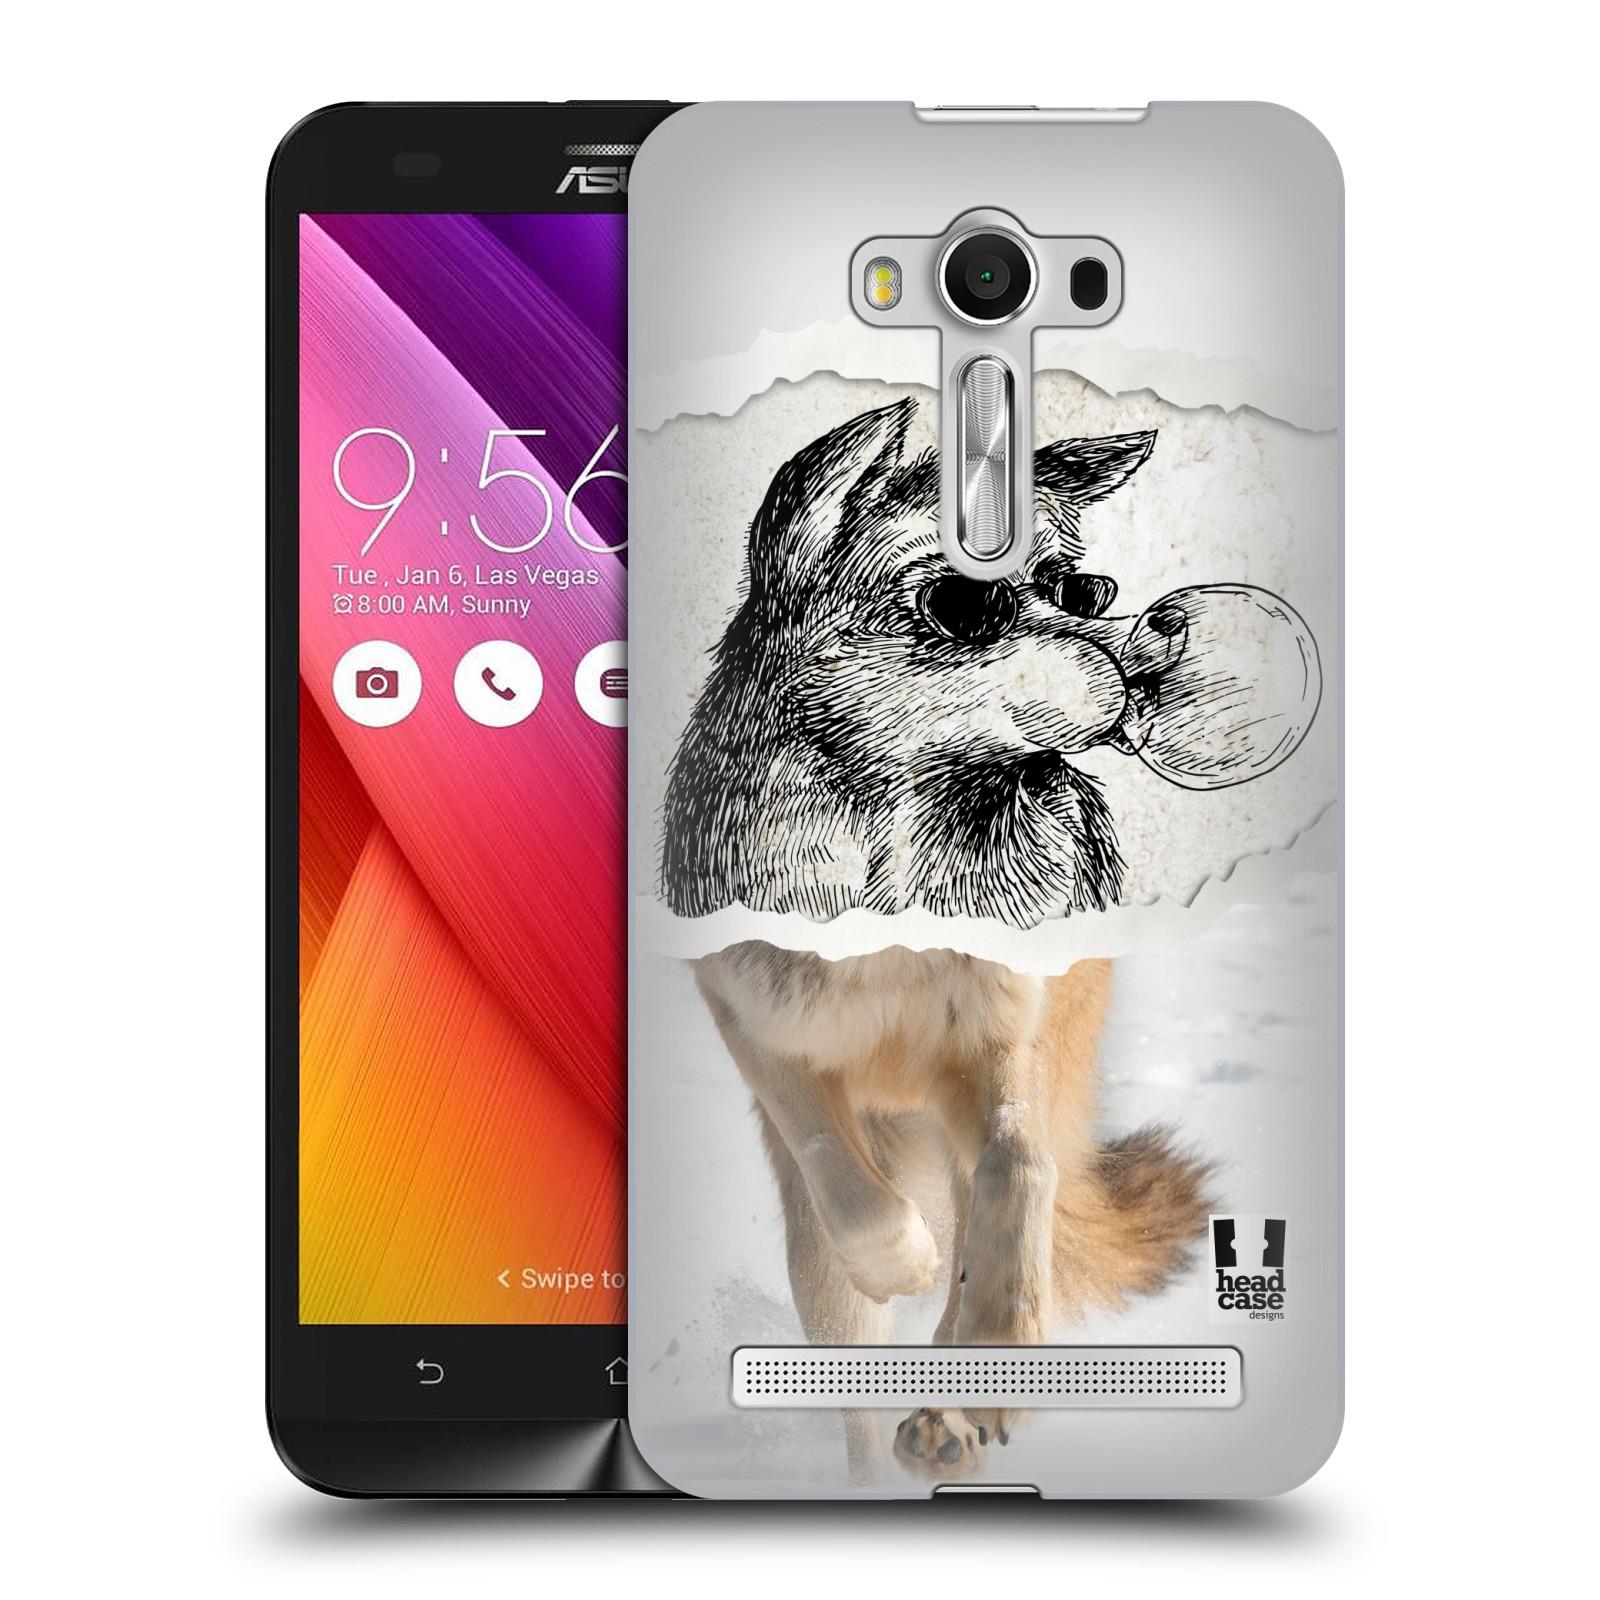 HEAD CASE plastový obal na mobil Asus Zenfone 2 LASER (5,5 displej ZE550KL) vzor zvířata koláž vlk pohodář